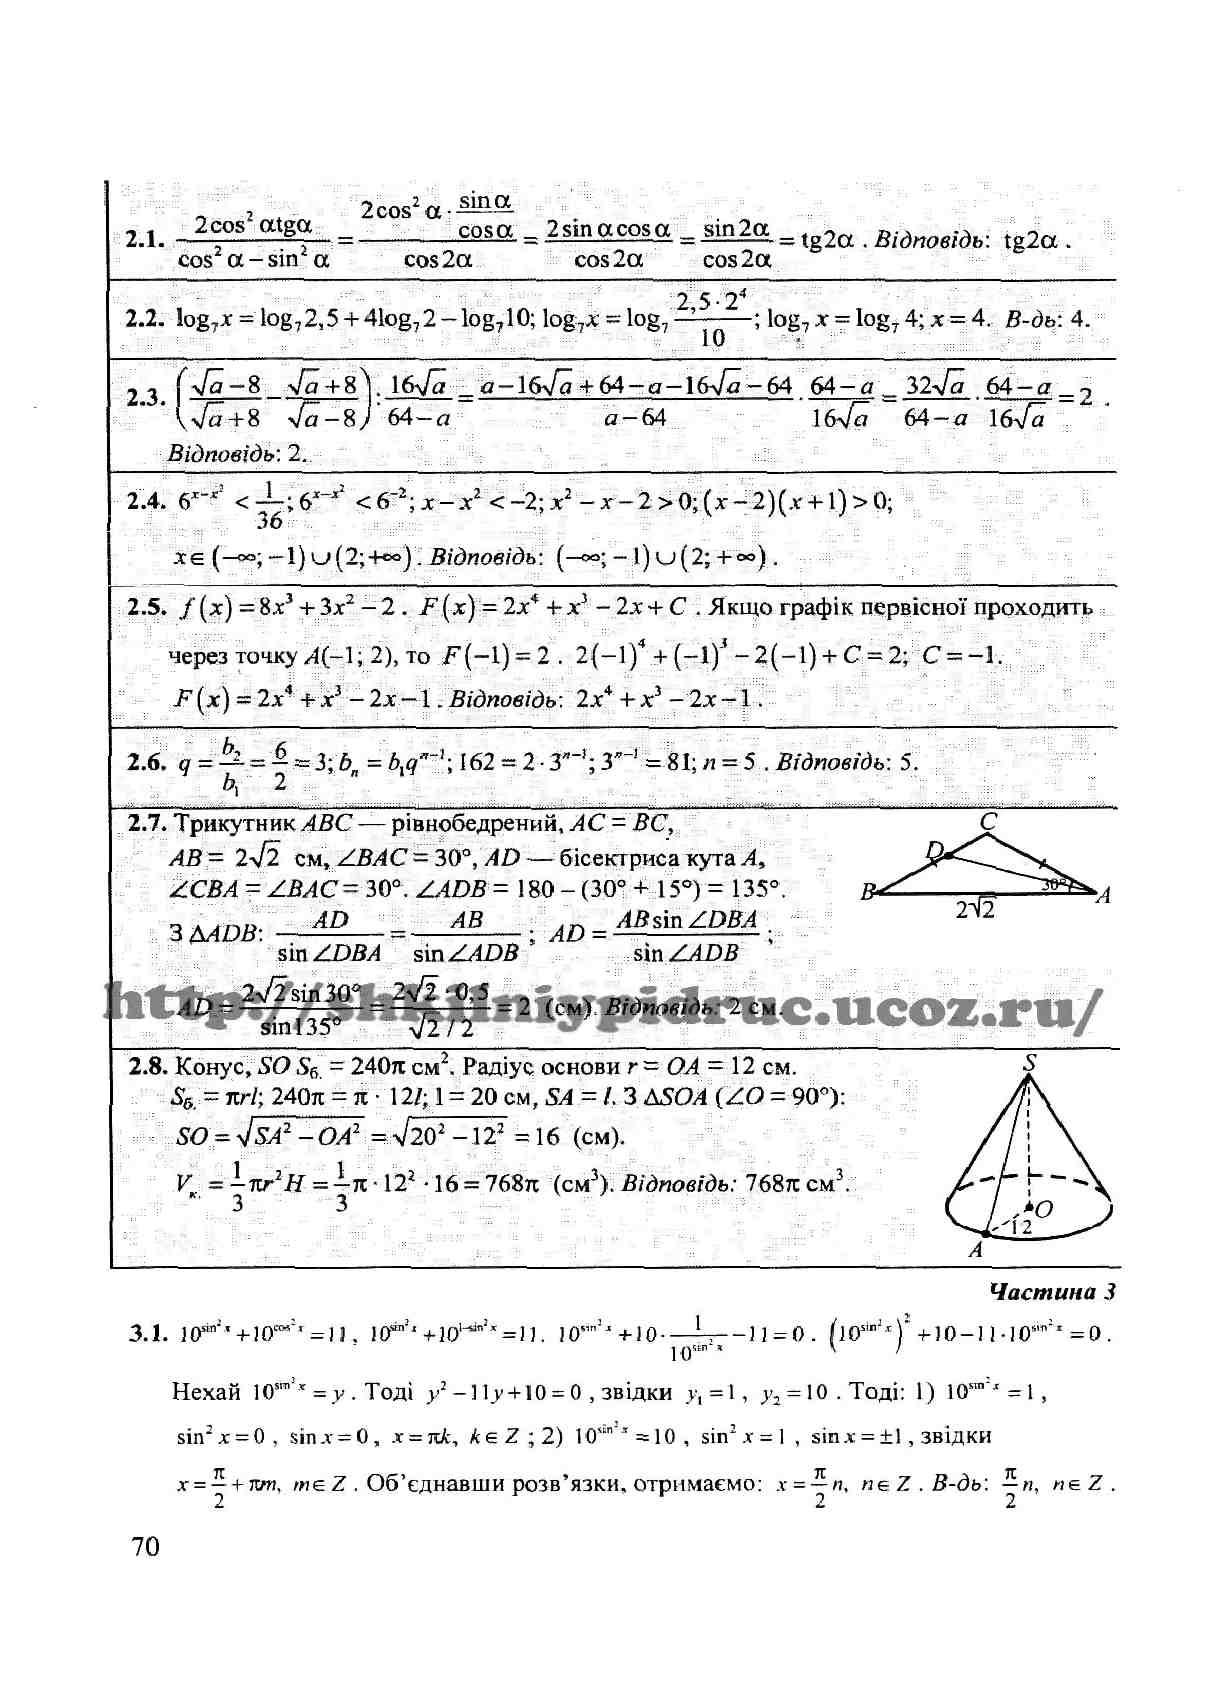 Дпа по математике 11 класс 2018 решебник онлайн